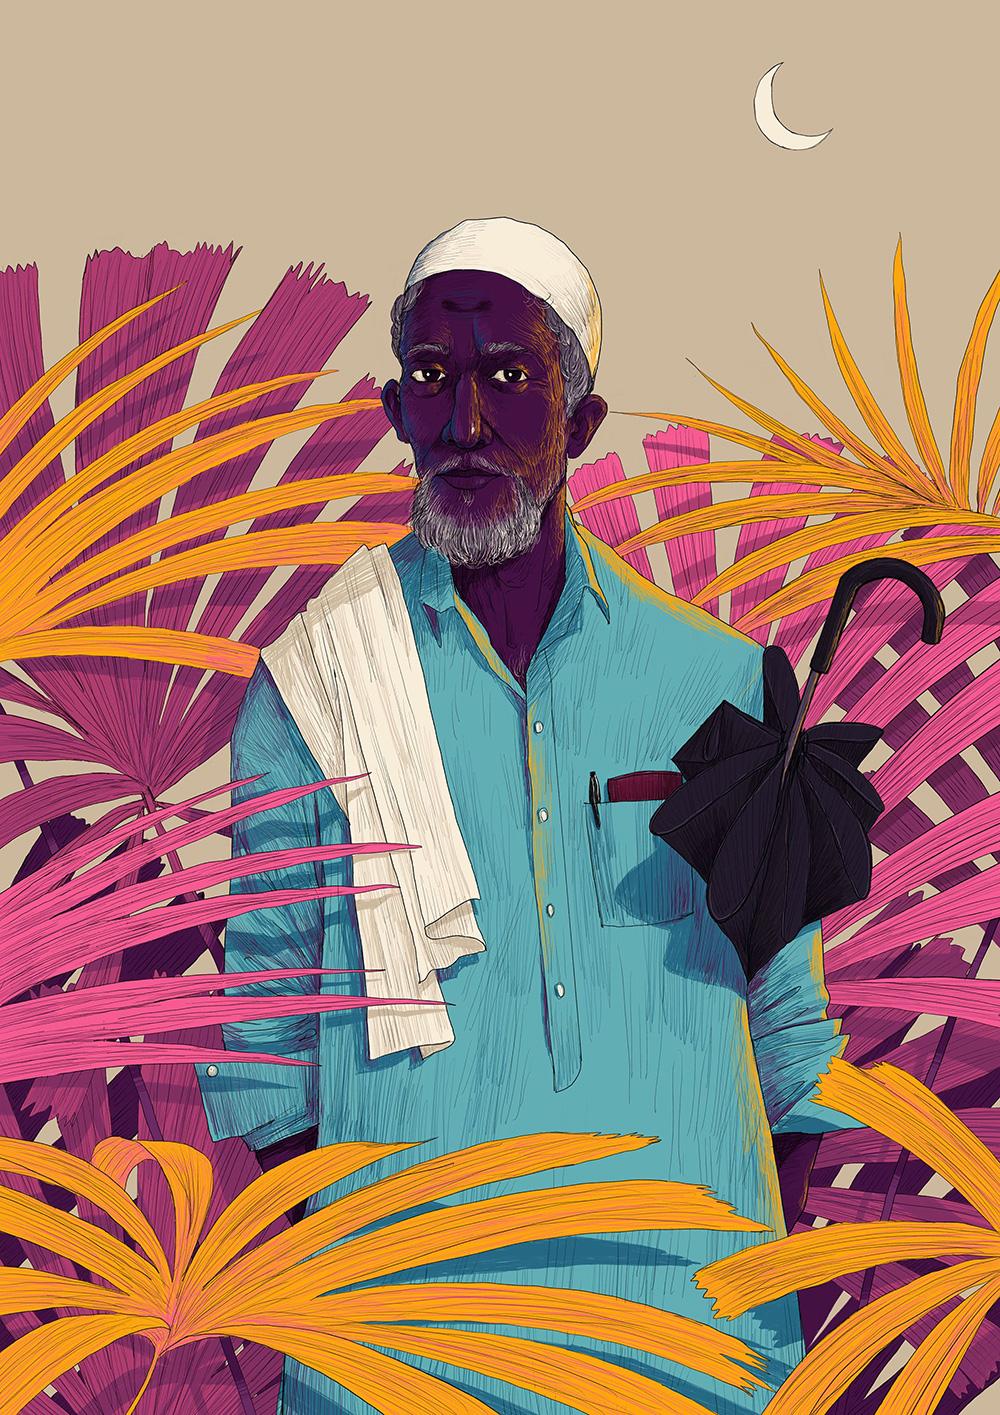 全球资讯_印度插画师Muhammed Sajid插画欣赏 - 视觉同盟(VisionUnion.com)